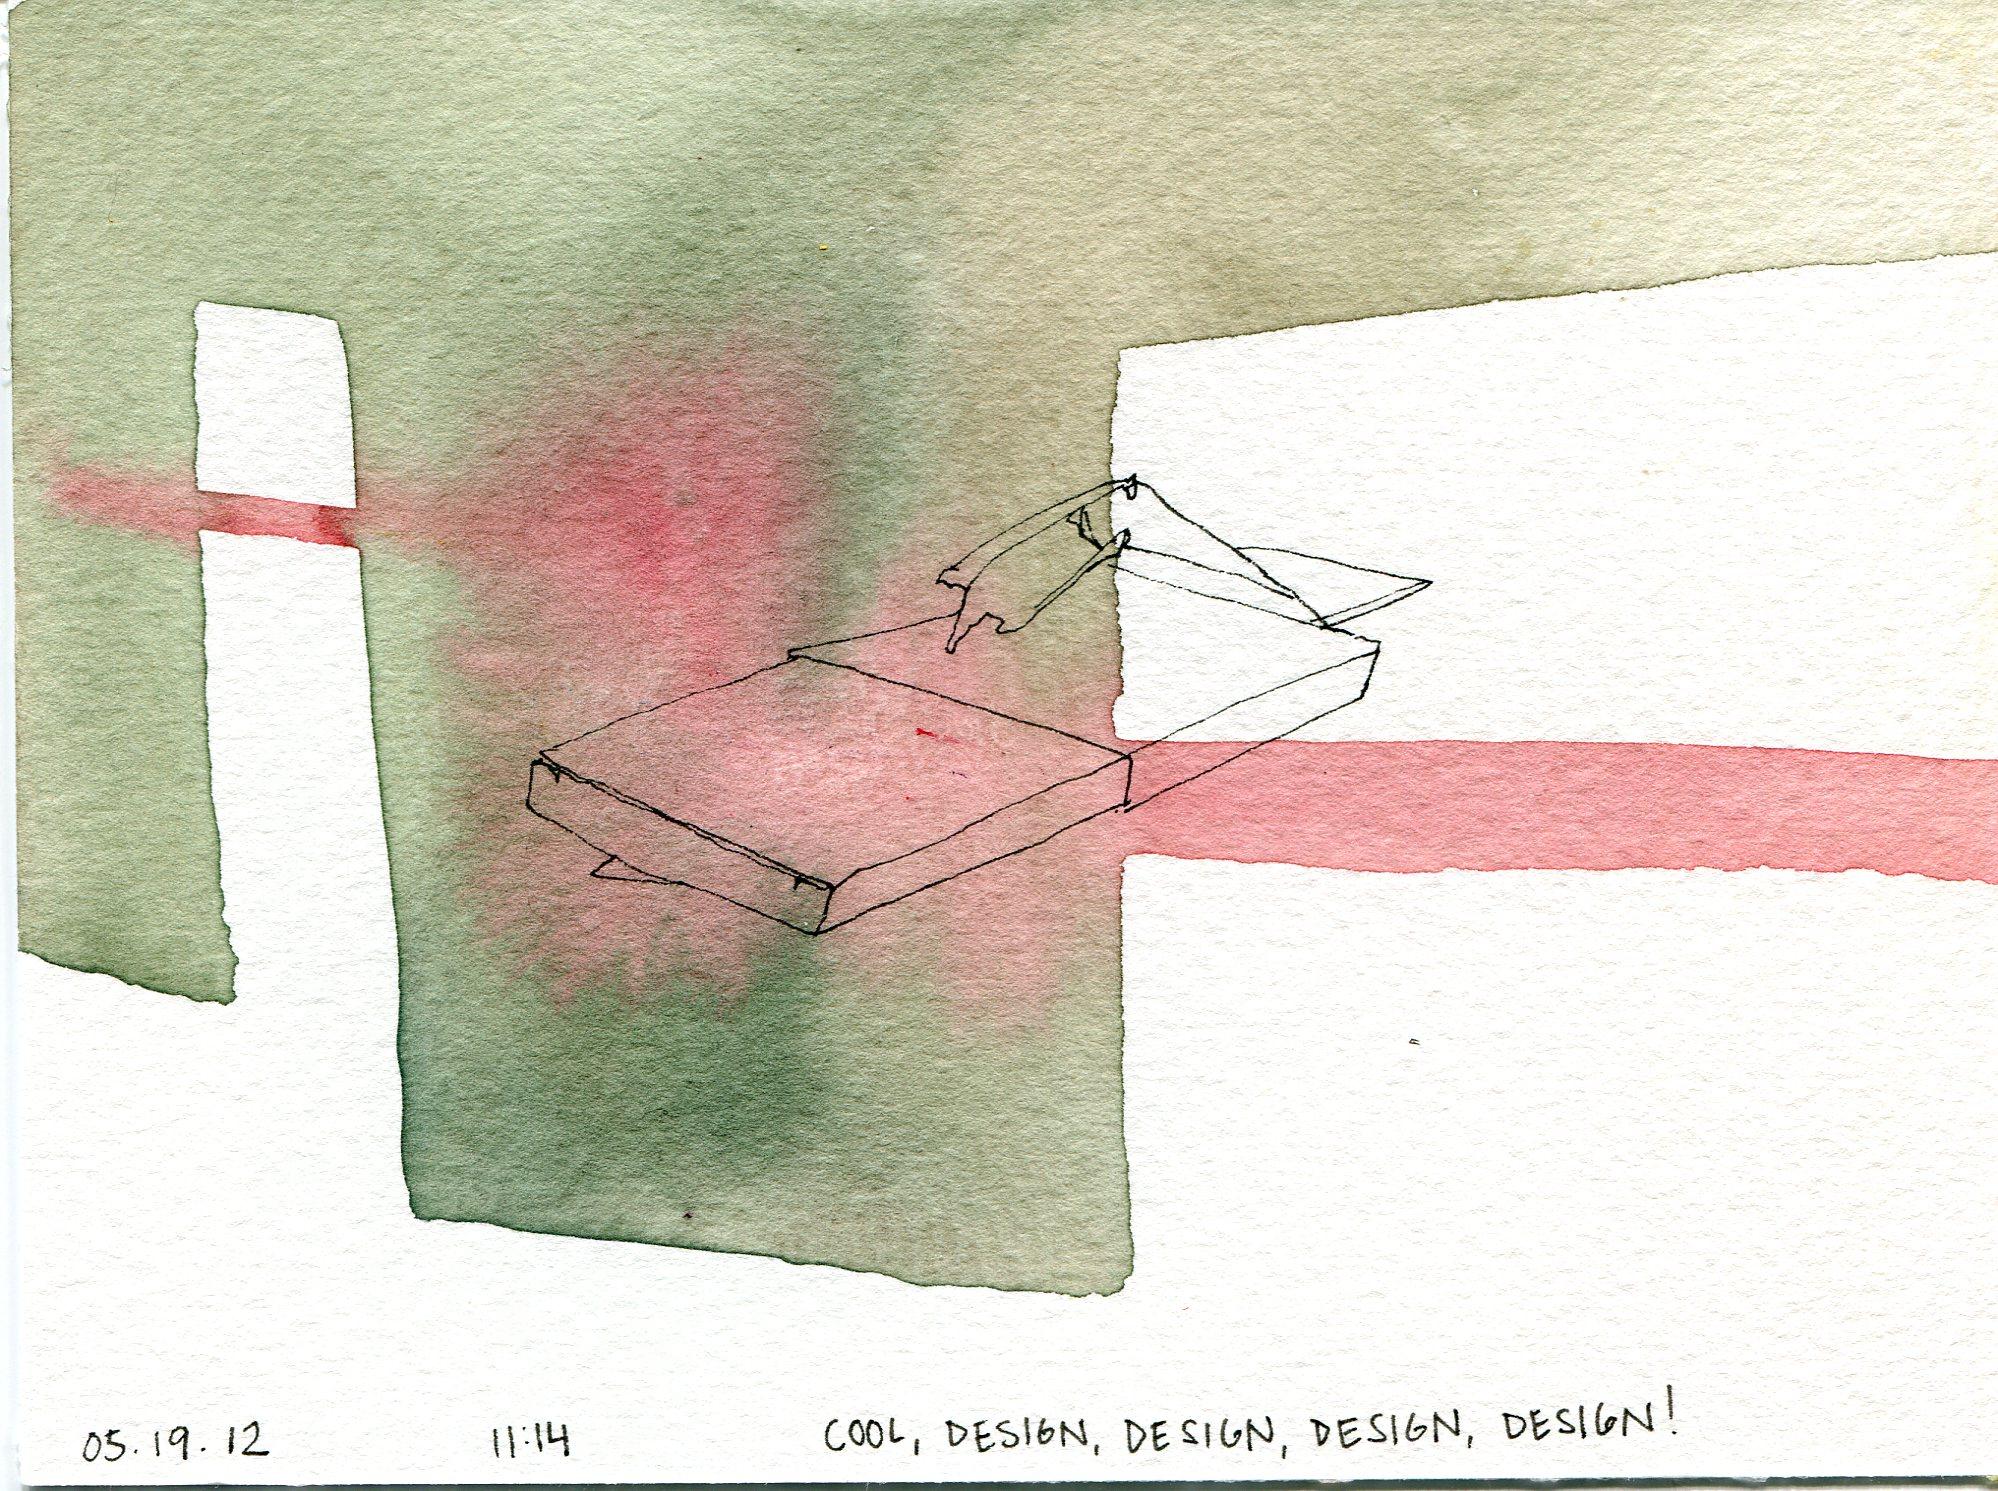 2012-05-19 drawing007.jpg